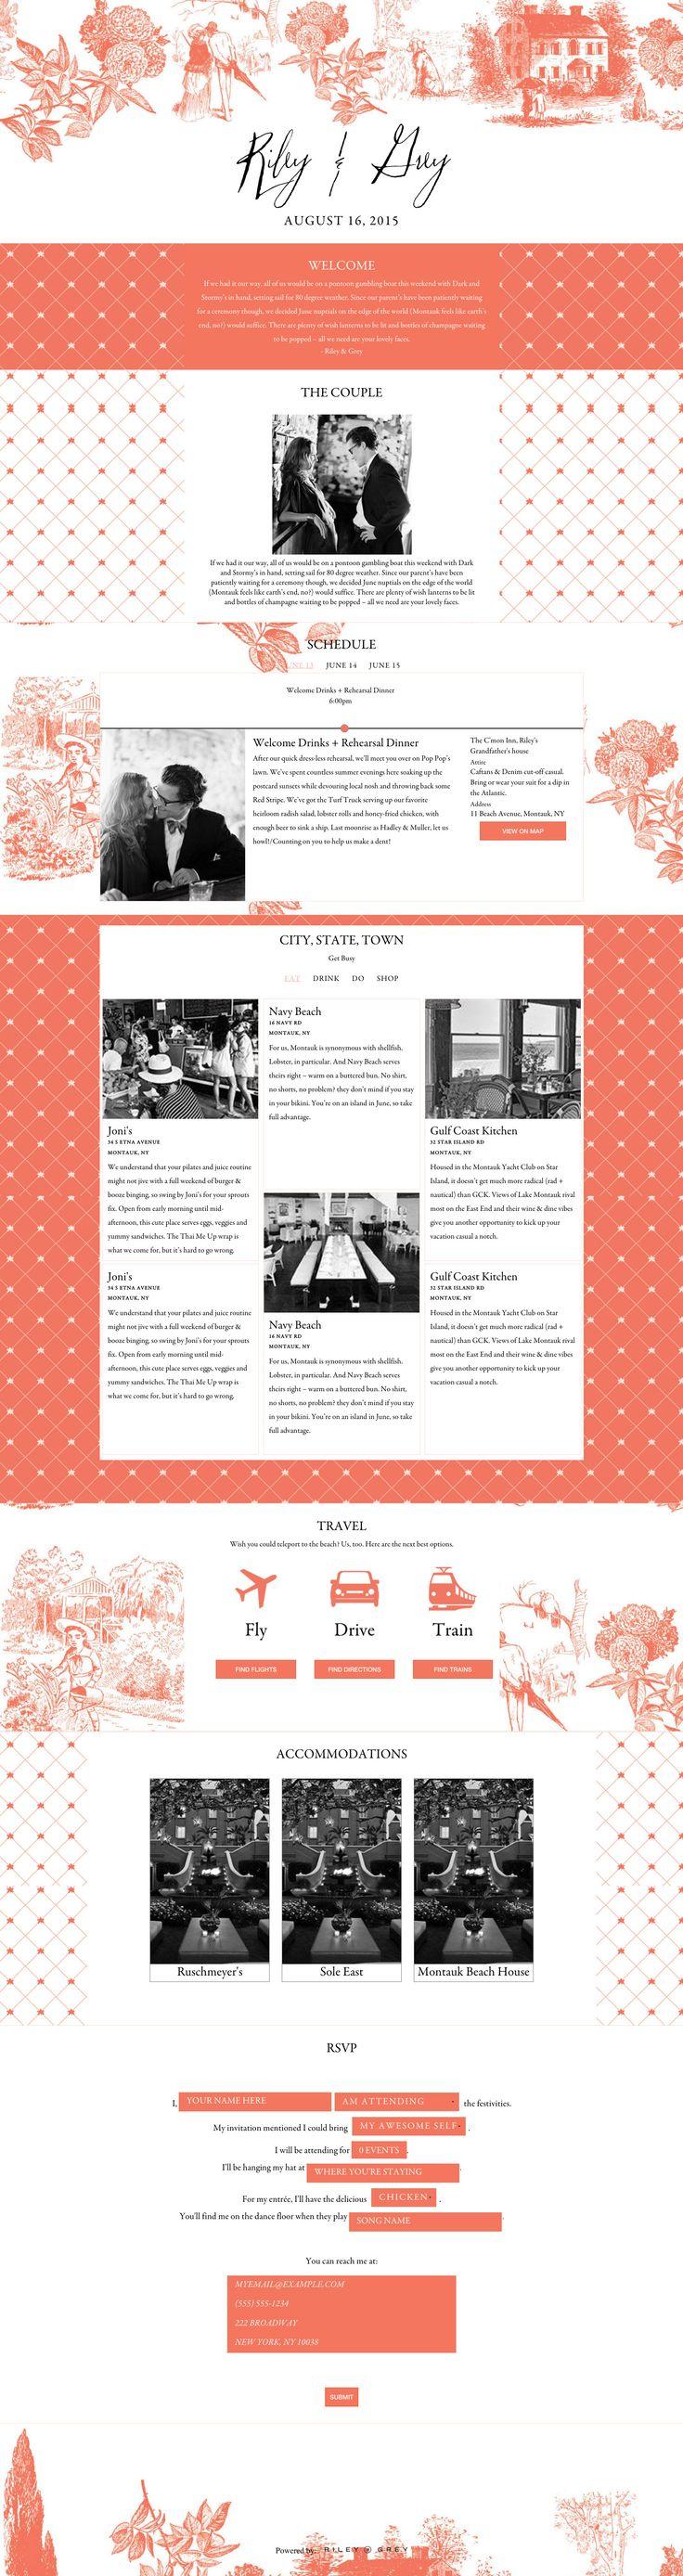 """toile"" wedding website design by Riley & Grey (graphic design, wedding planning, wedding website examples)"